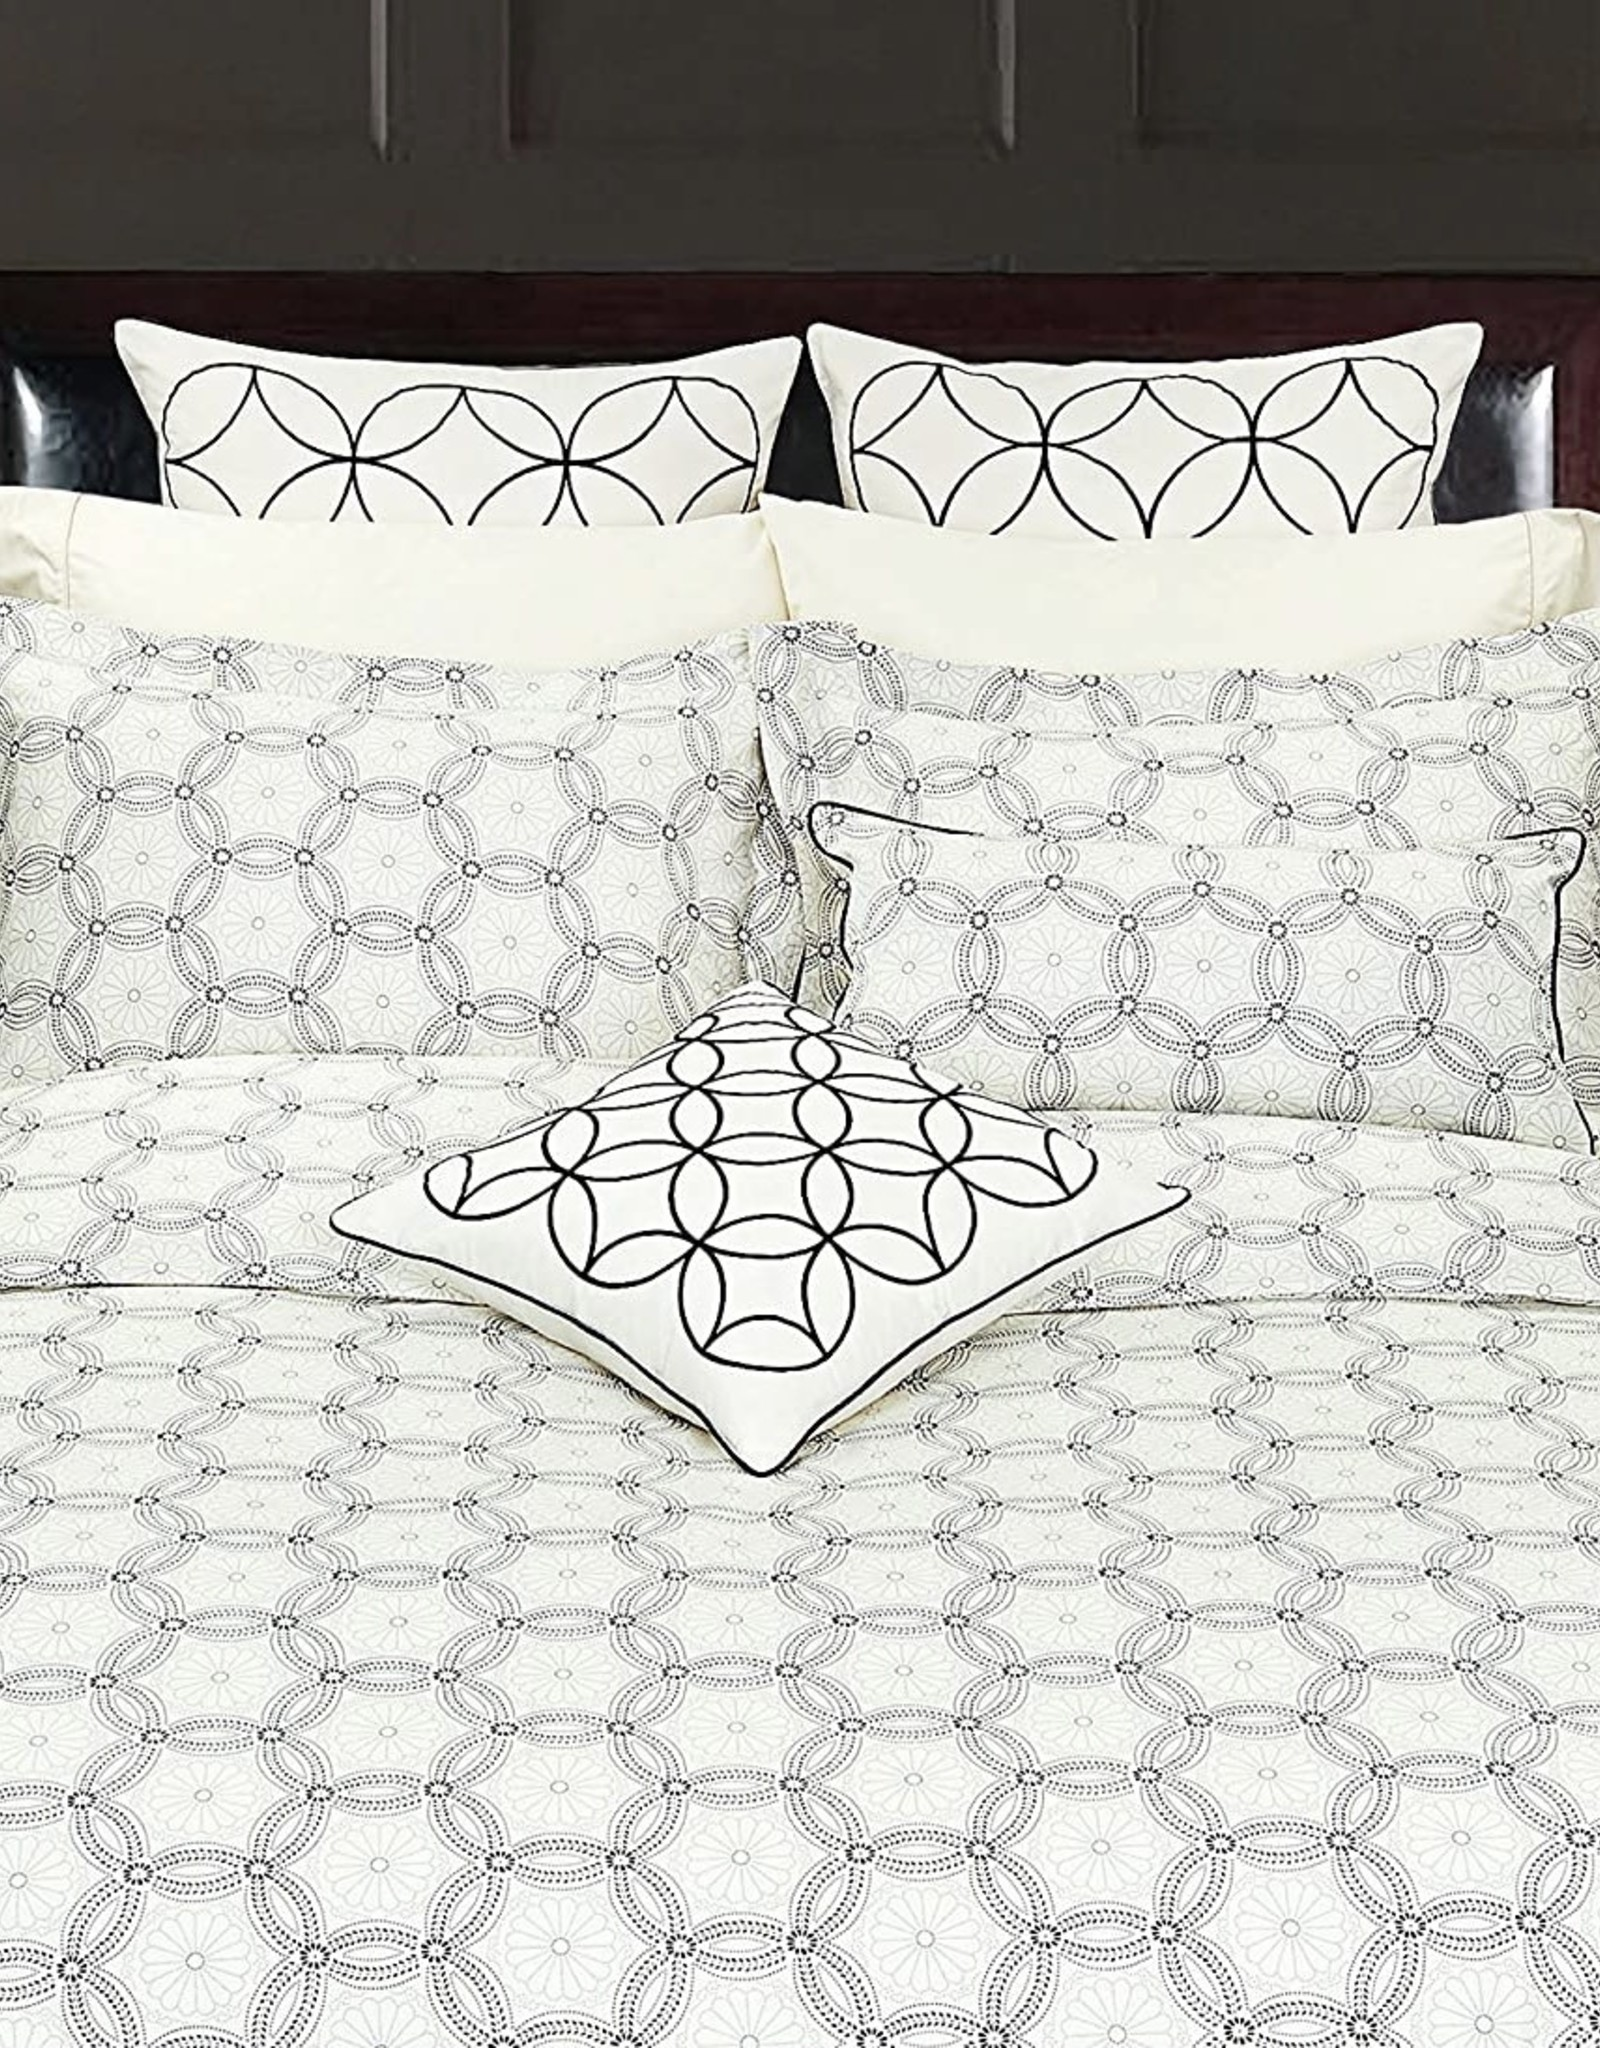 Duvet Set Highland Feather Spiral Graph Double Cover w / Pillow Case